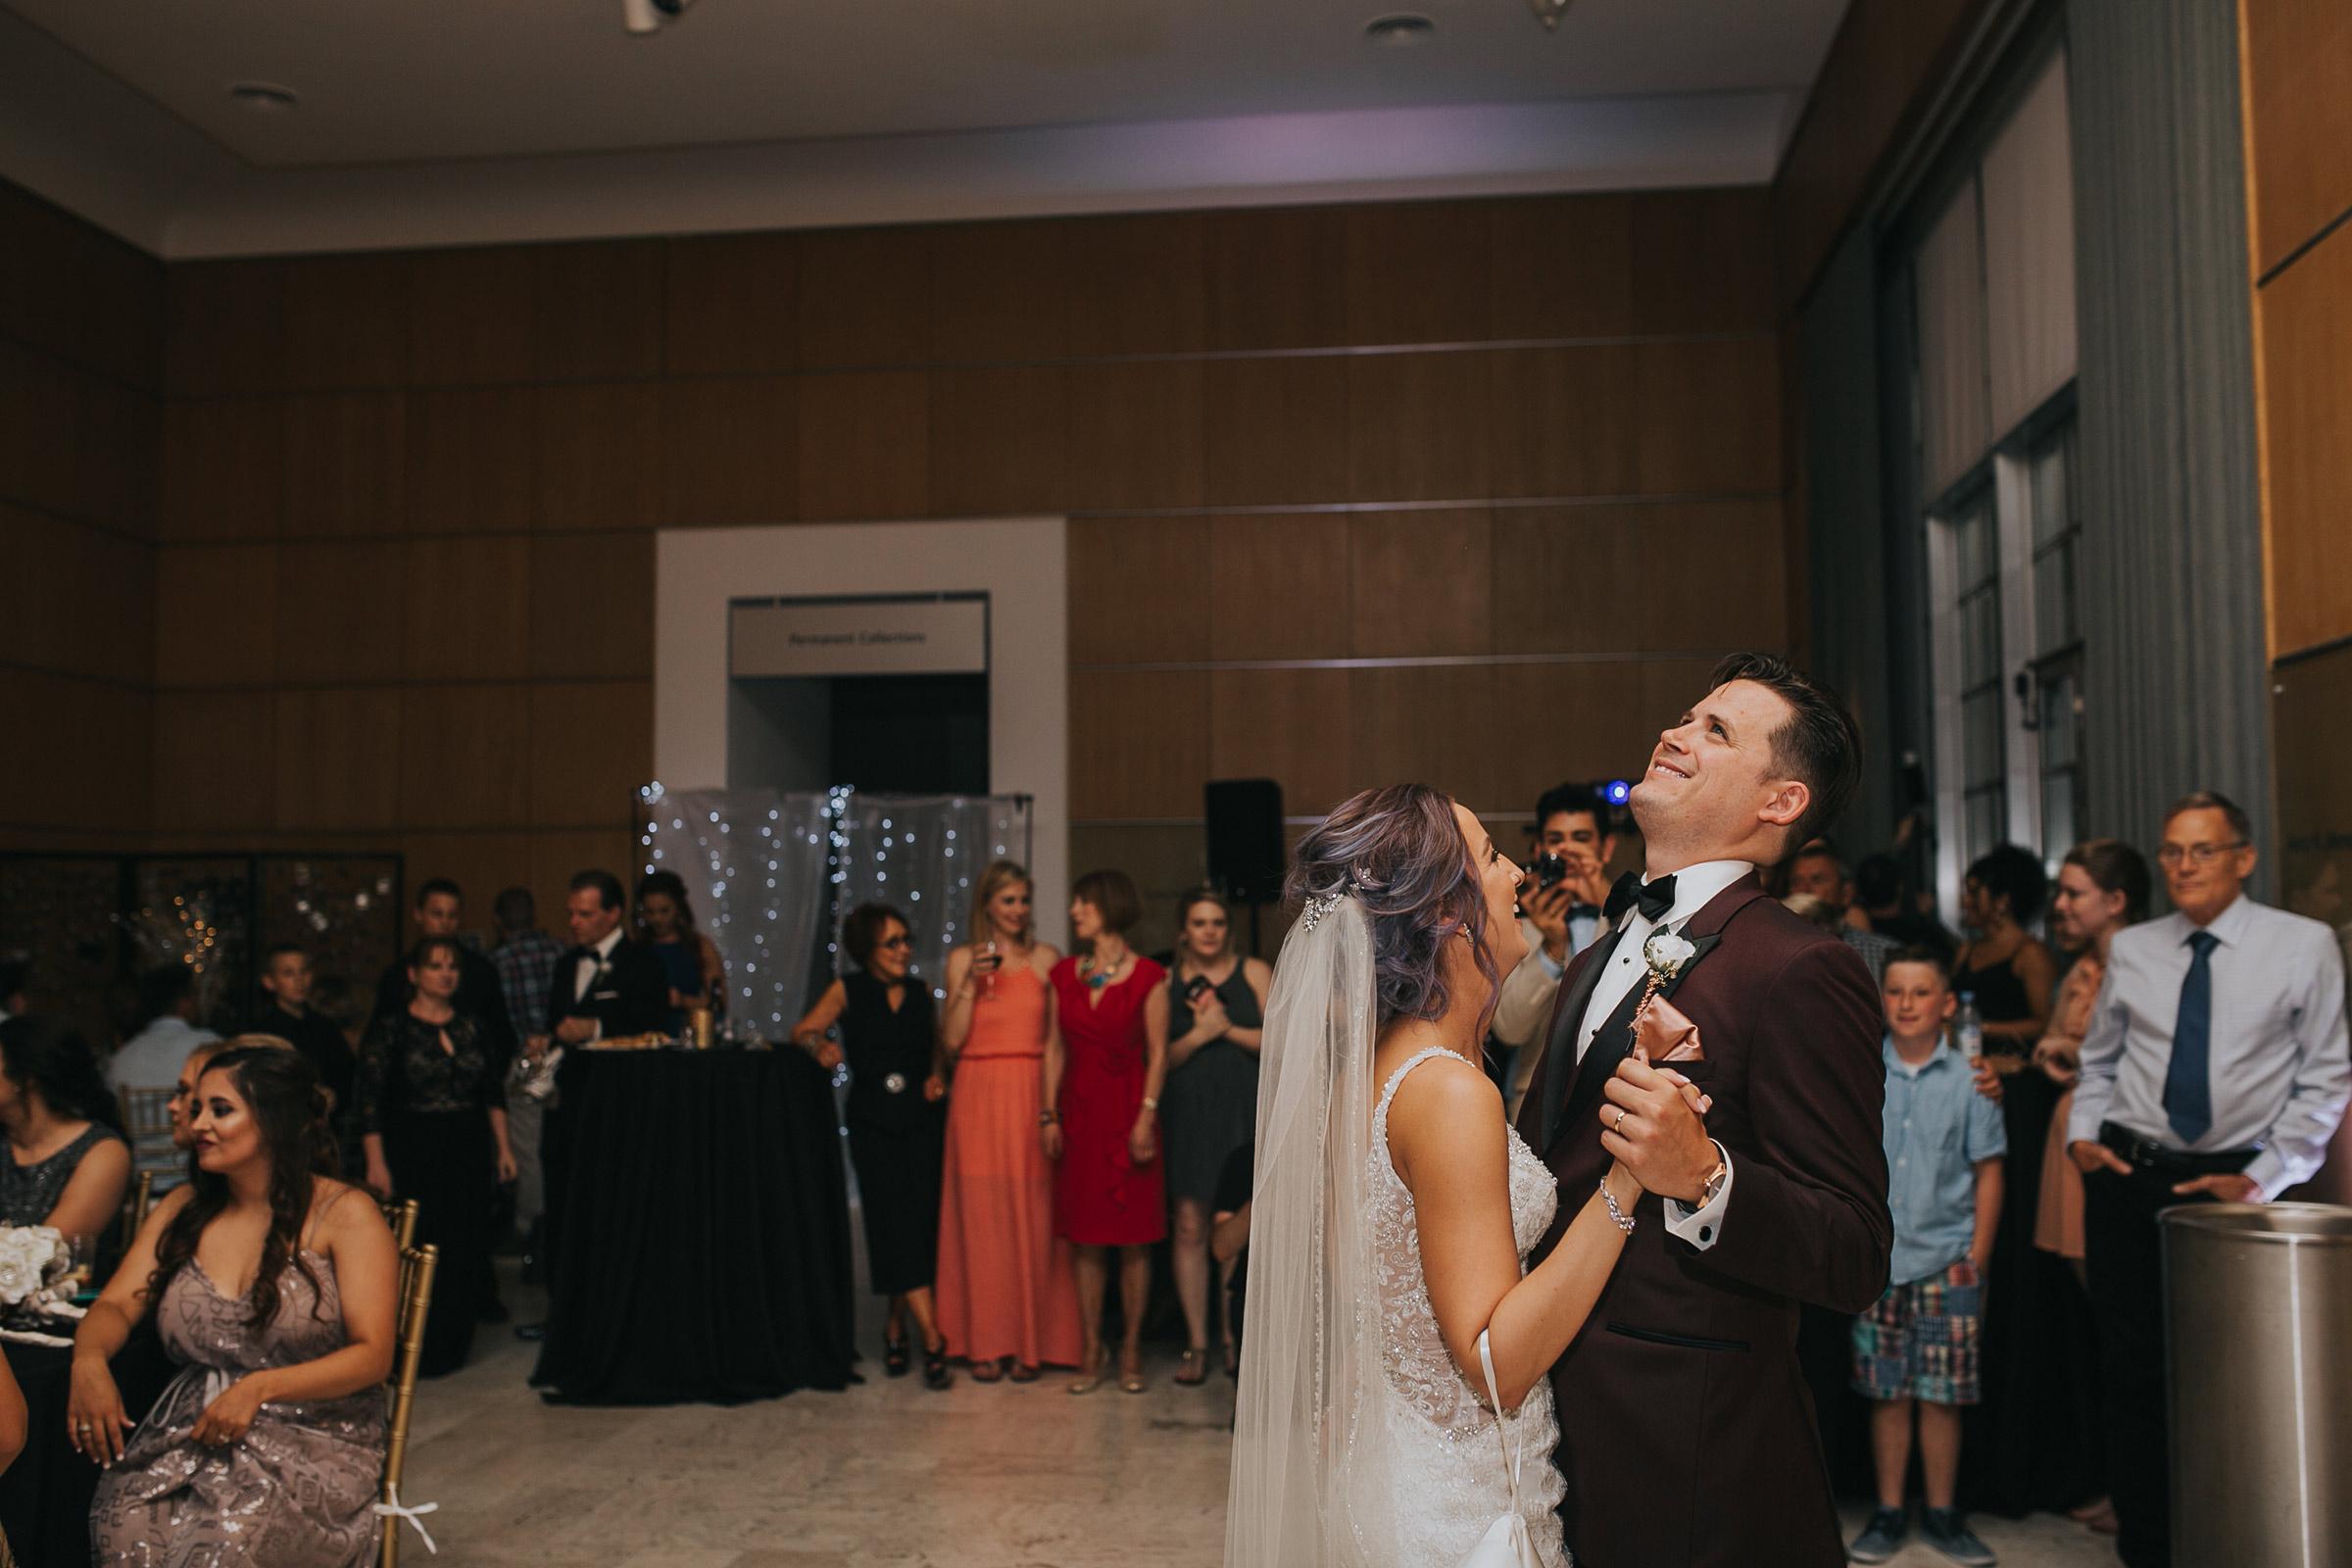 bride-groom-first-dance-laughing-desmoines-iowa-art-center-raelyn-ramey-photography.jpg